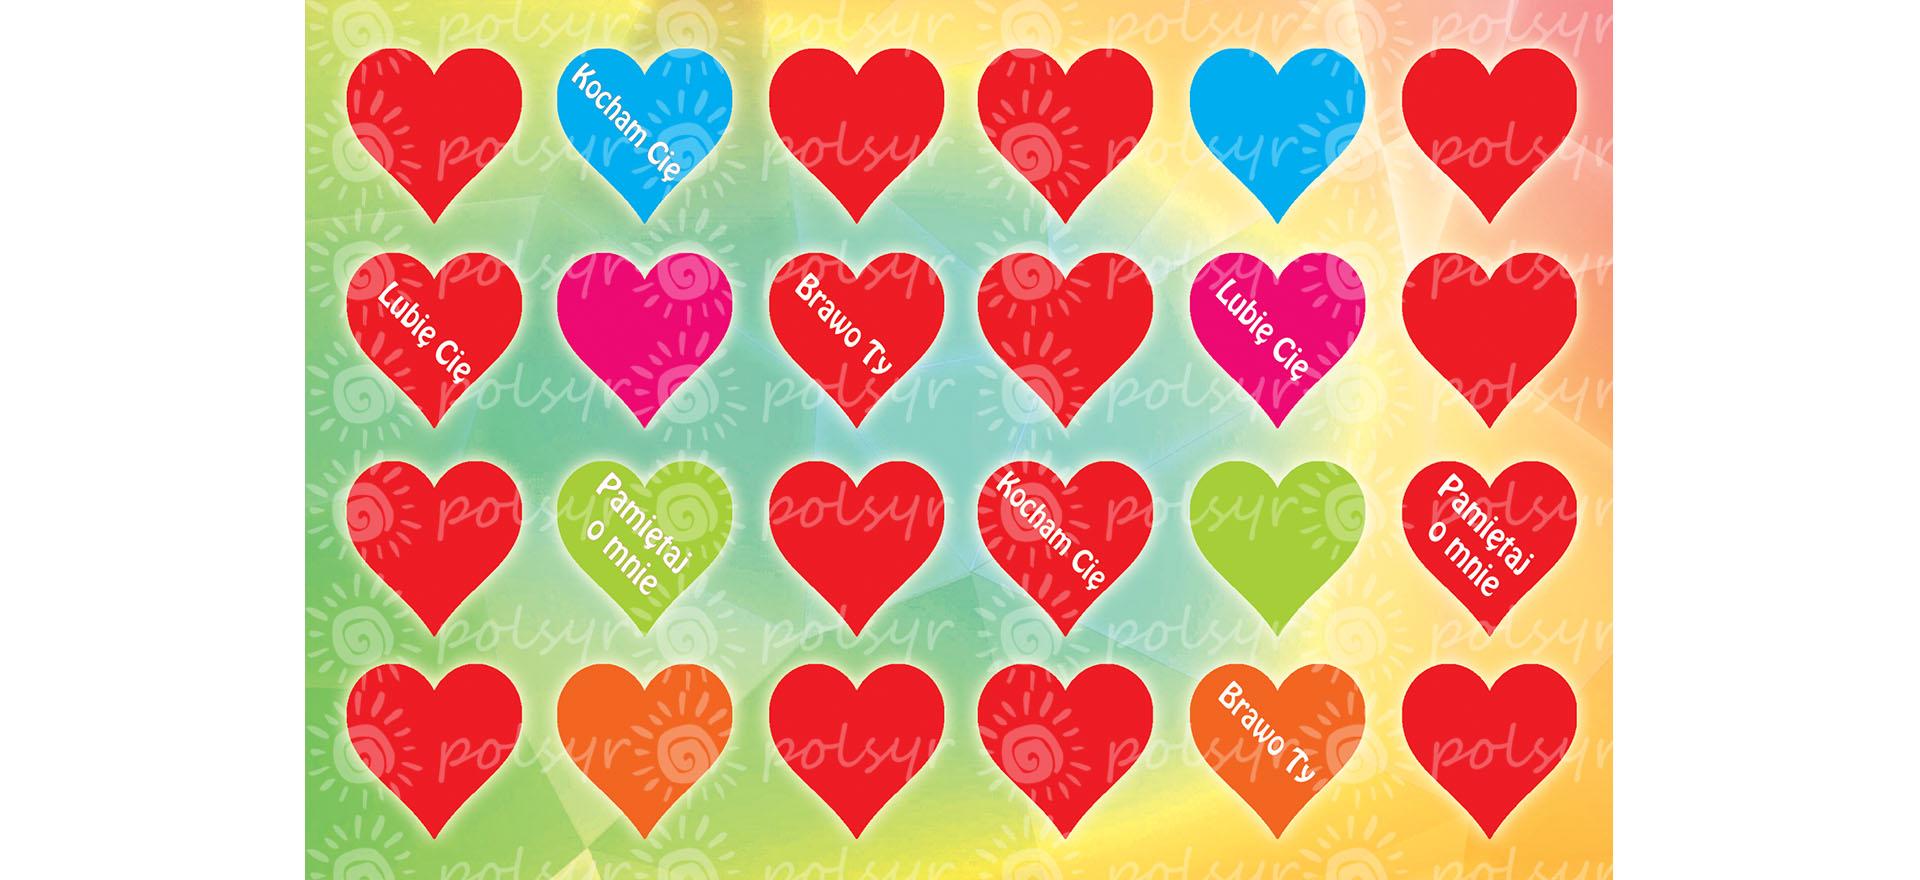 naklejki-serca-male-polsyr-3